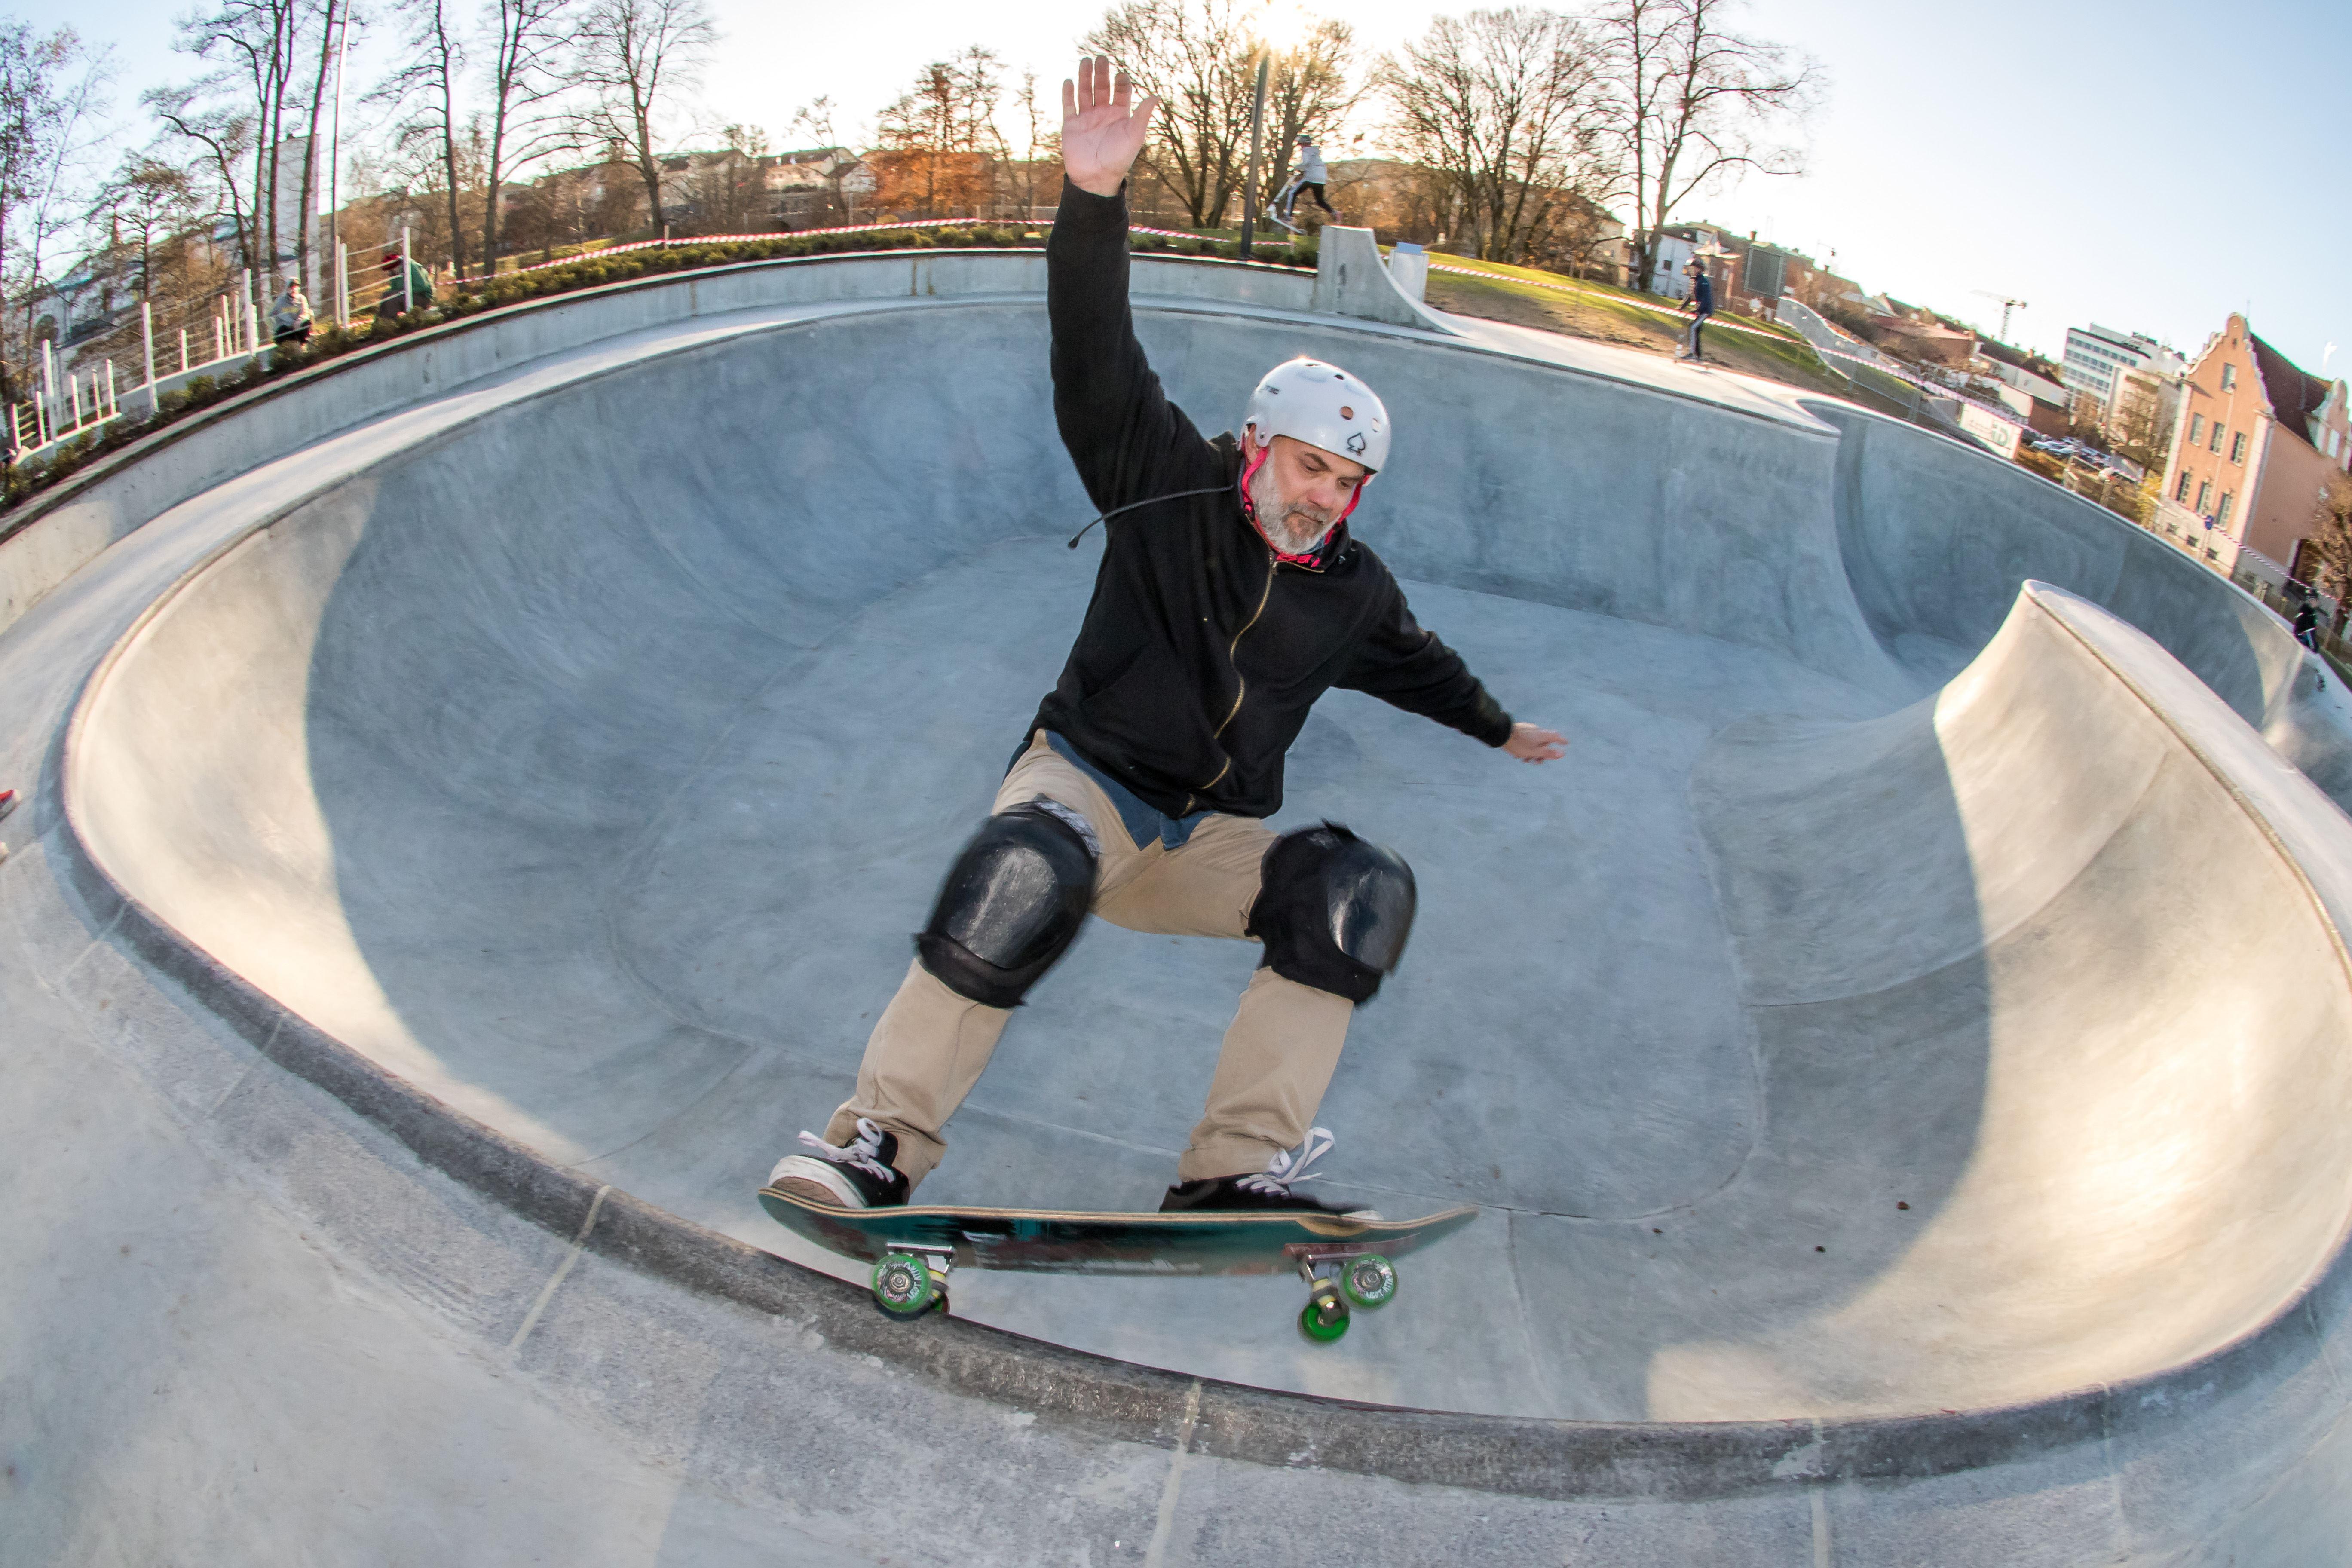 Patric Backlund,  © Värnamo Näringsliv AB, Värnamo Skate Park